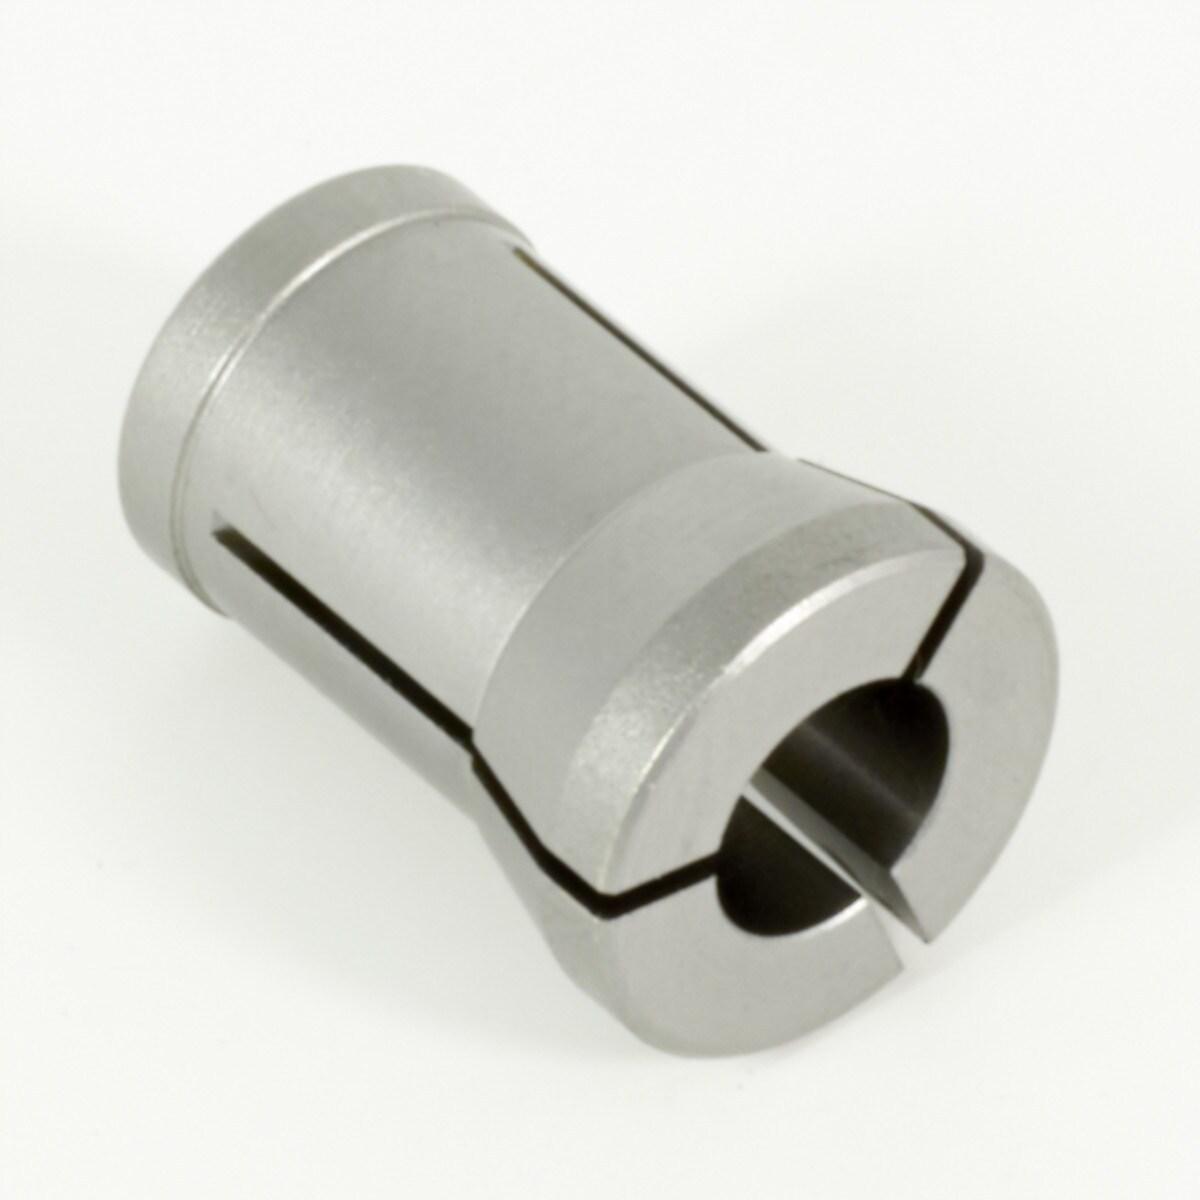 Kiristyshylsy 6 mm Bosch